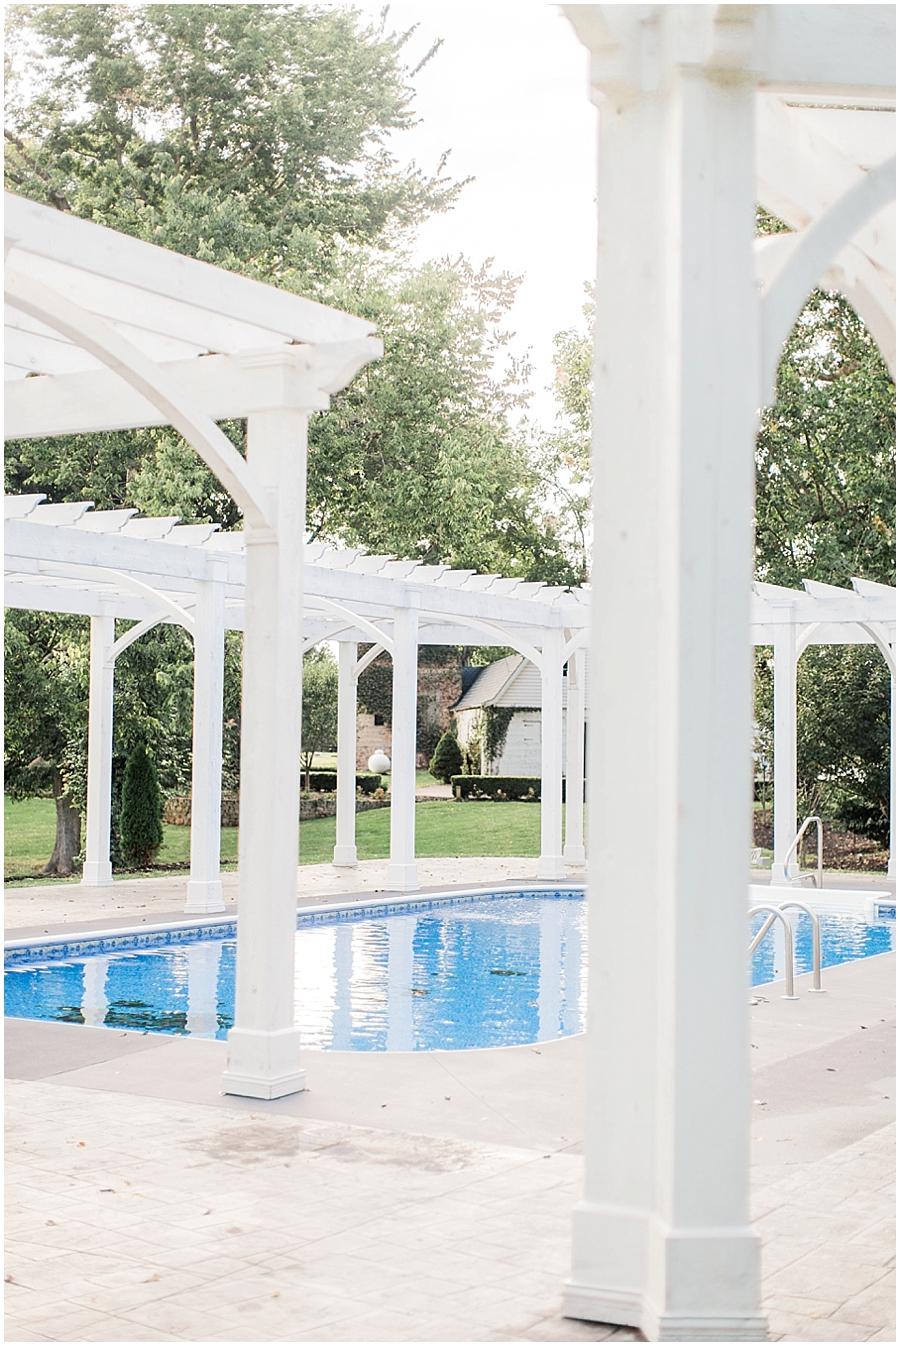 Missouri Wedding Venues - Haseltine Estate Tour by Jordan Brittley Photography